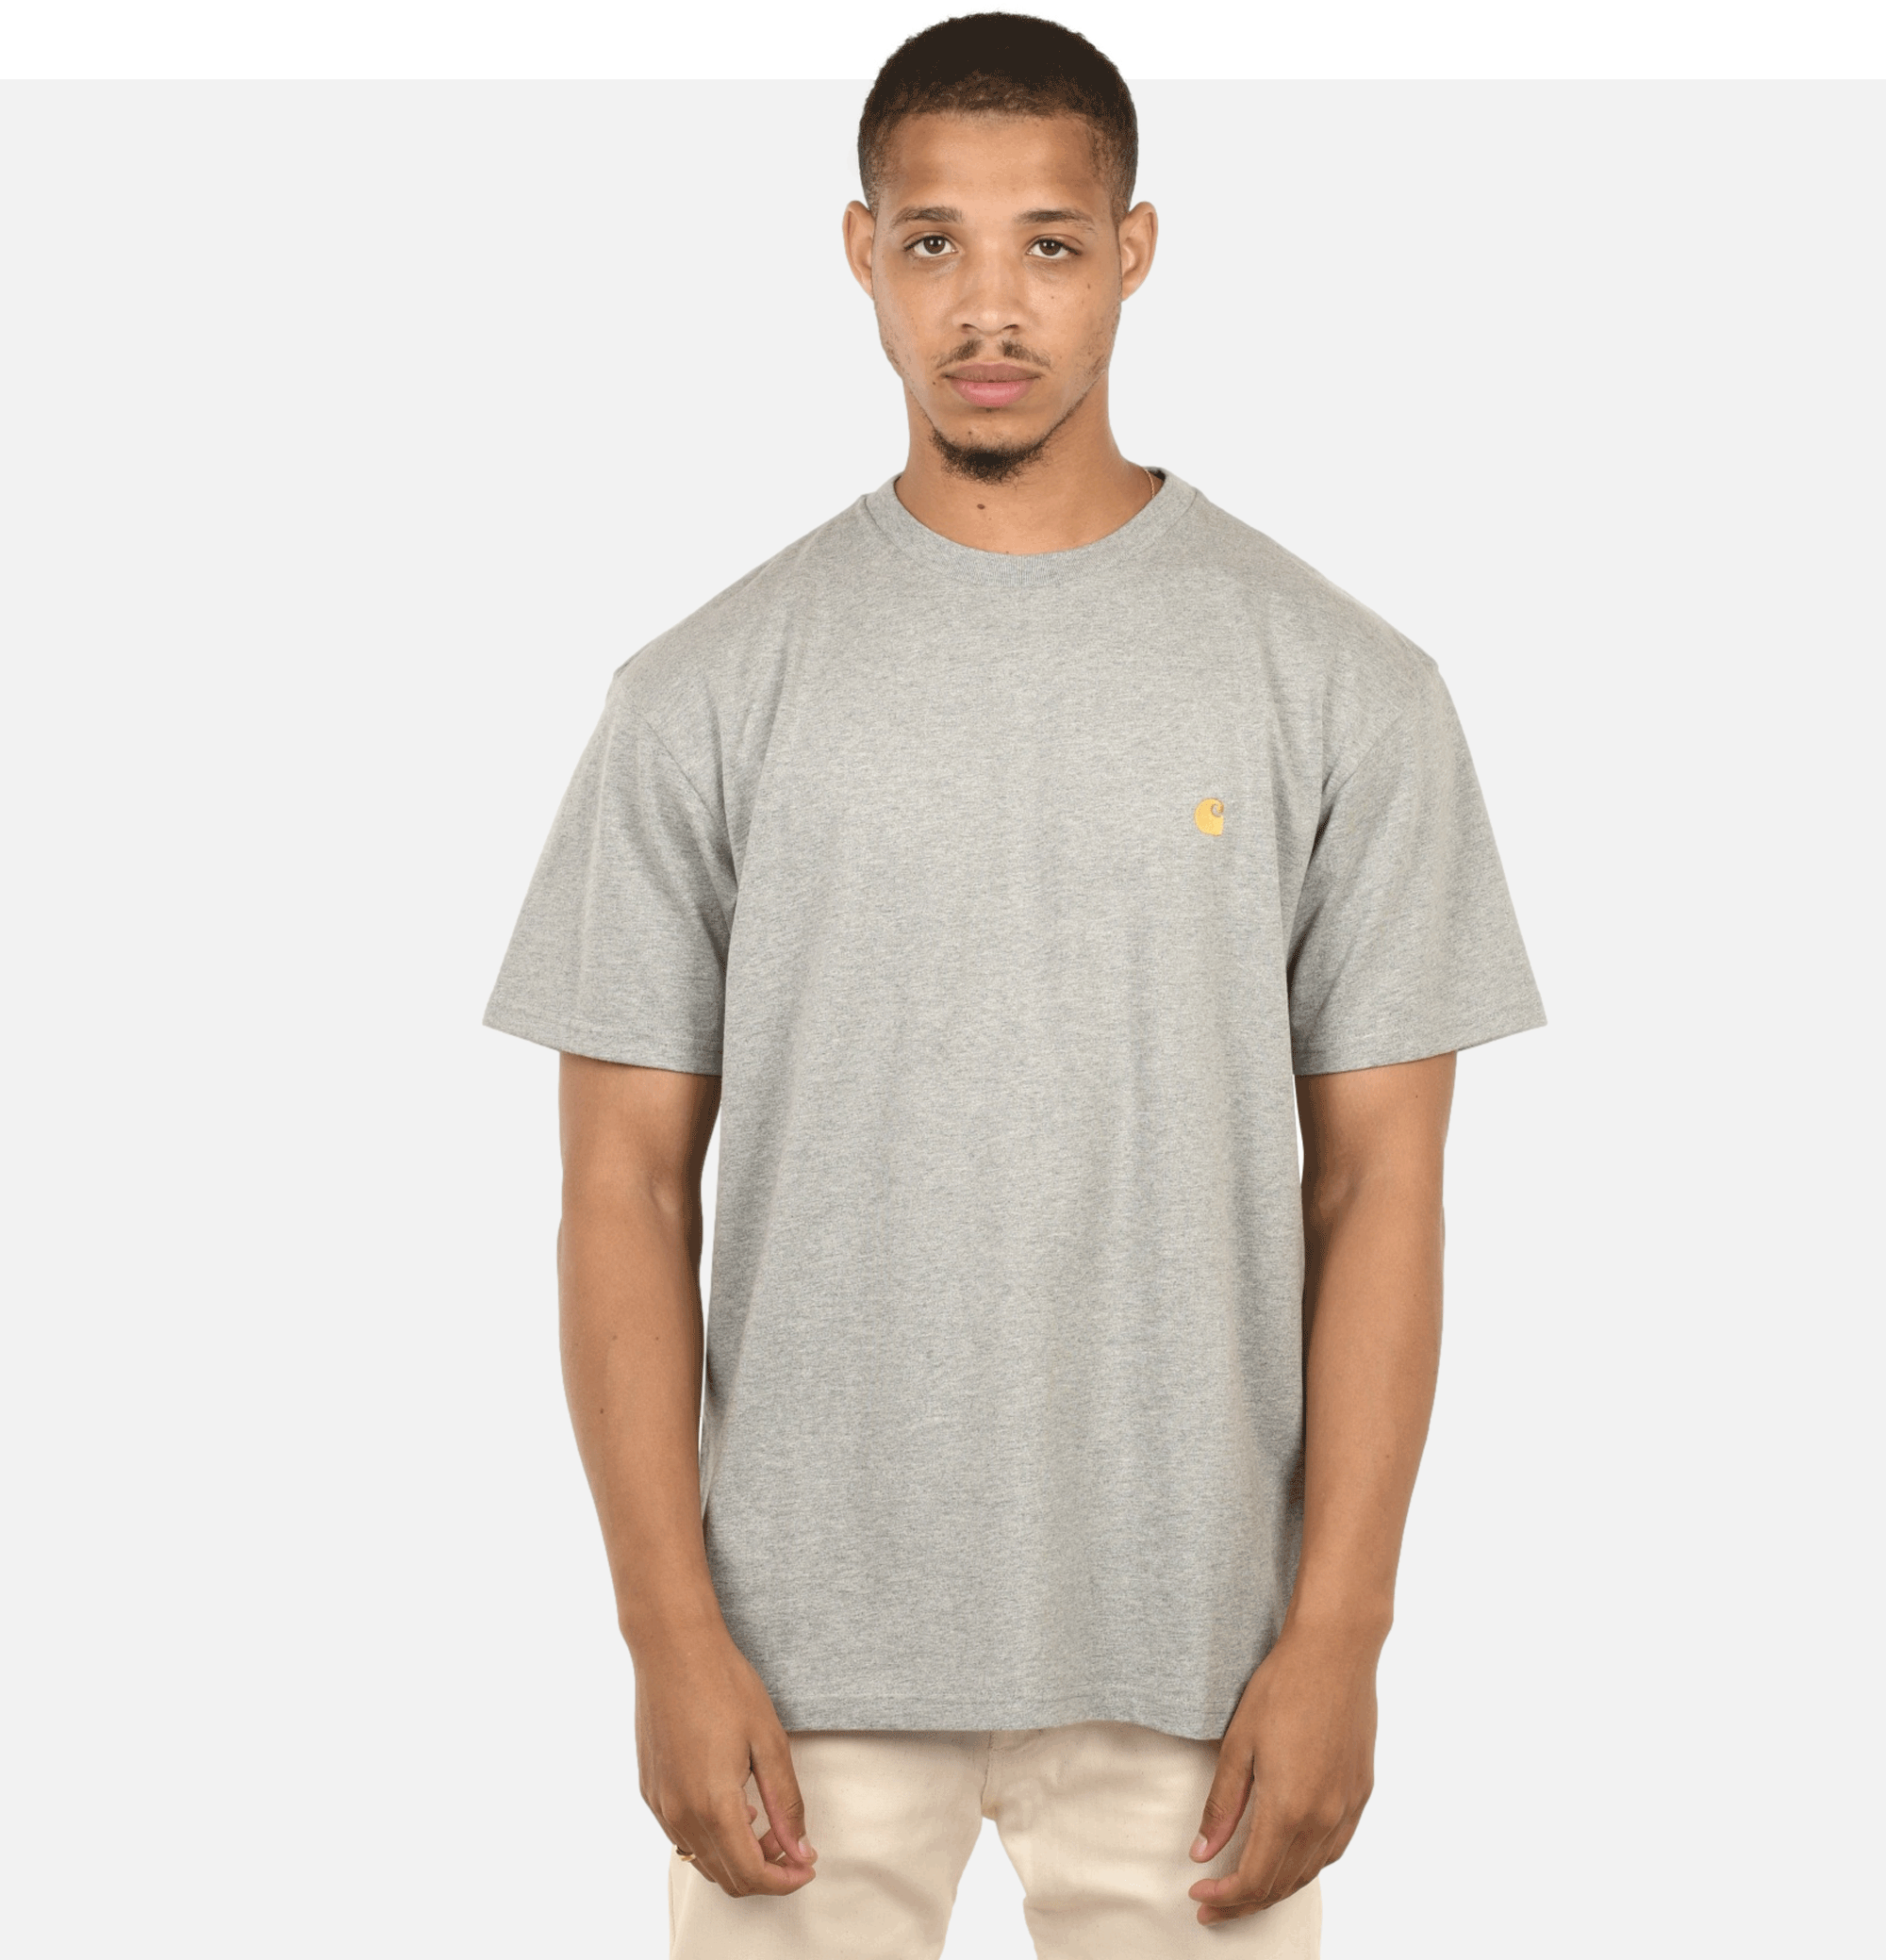 Chase T-shirt Grey